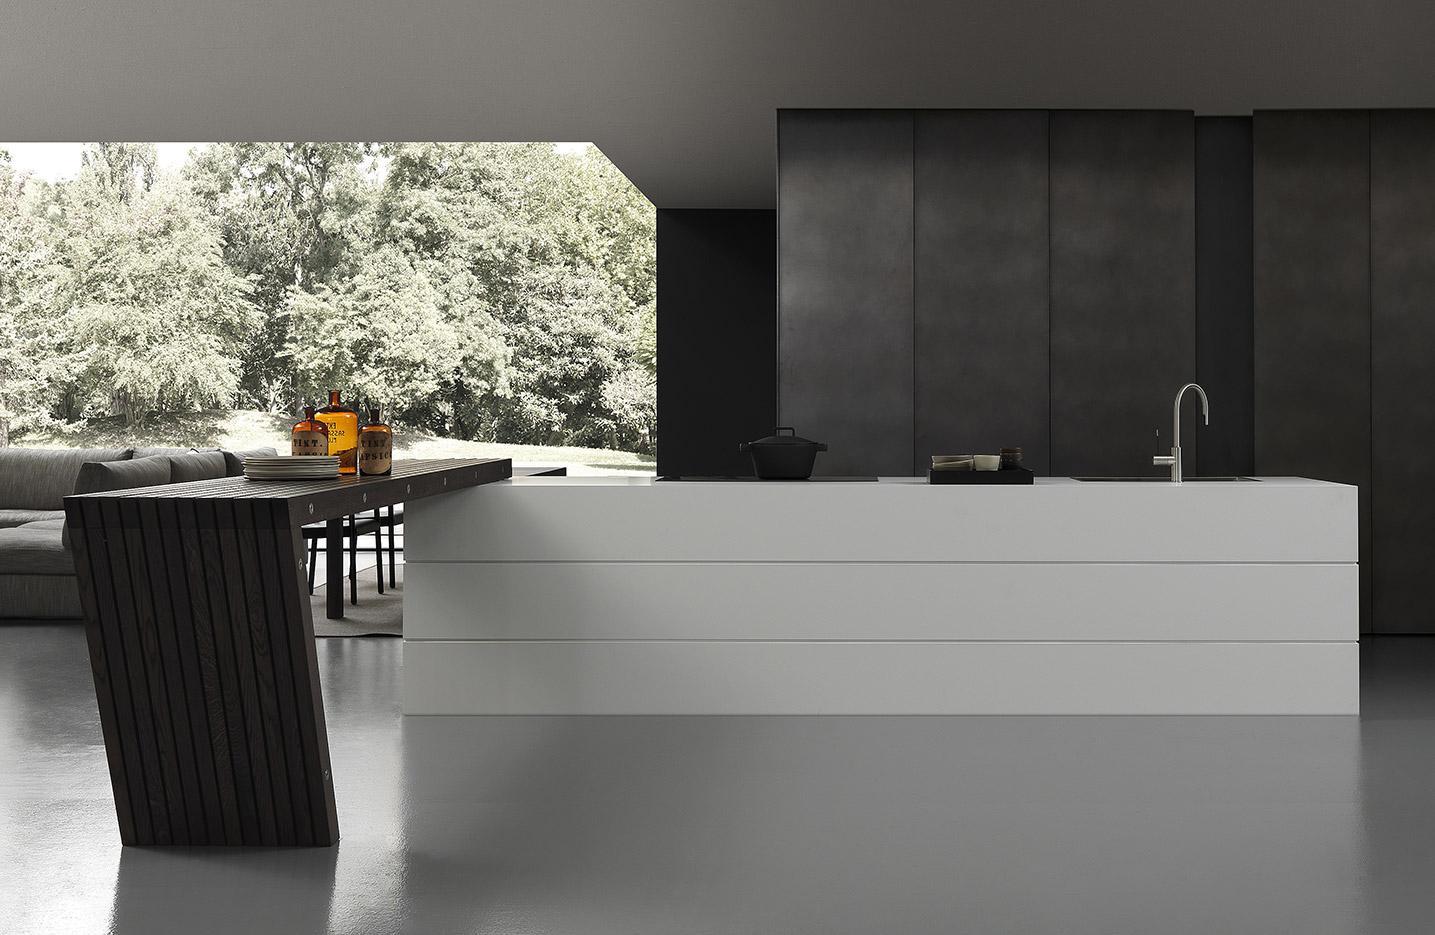 blade cucina di modulnova cucine arredamento mollura home design. Black Bedroom Furniture Sets. Home Design Ideas